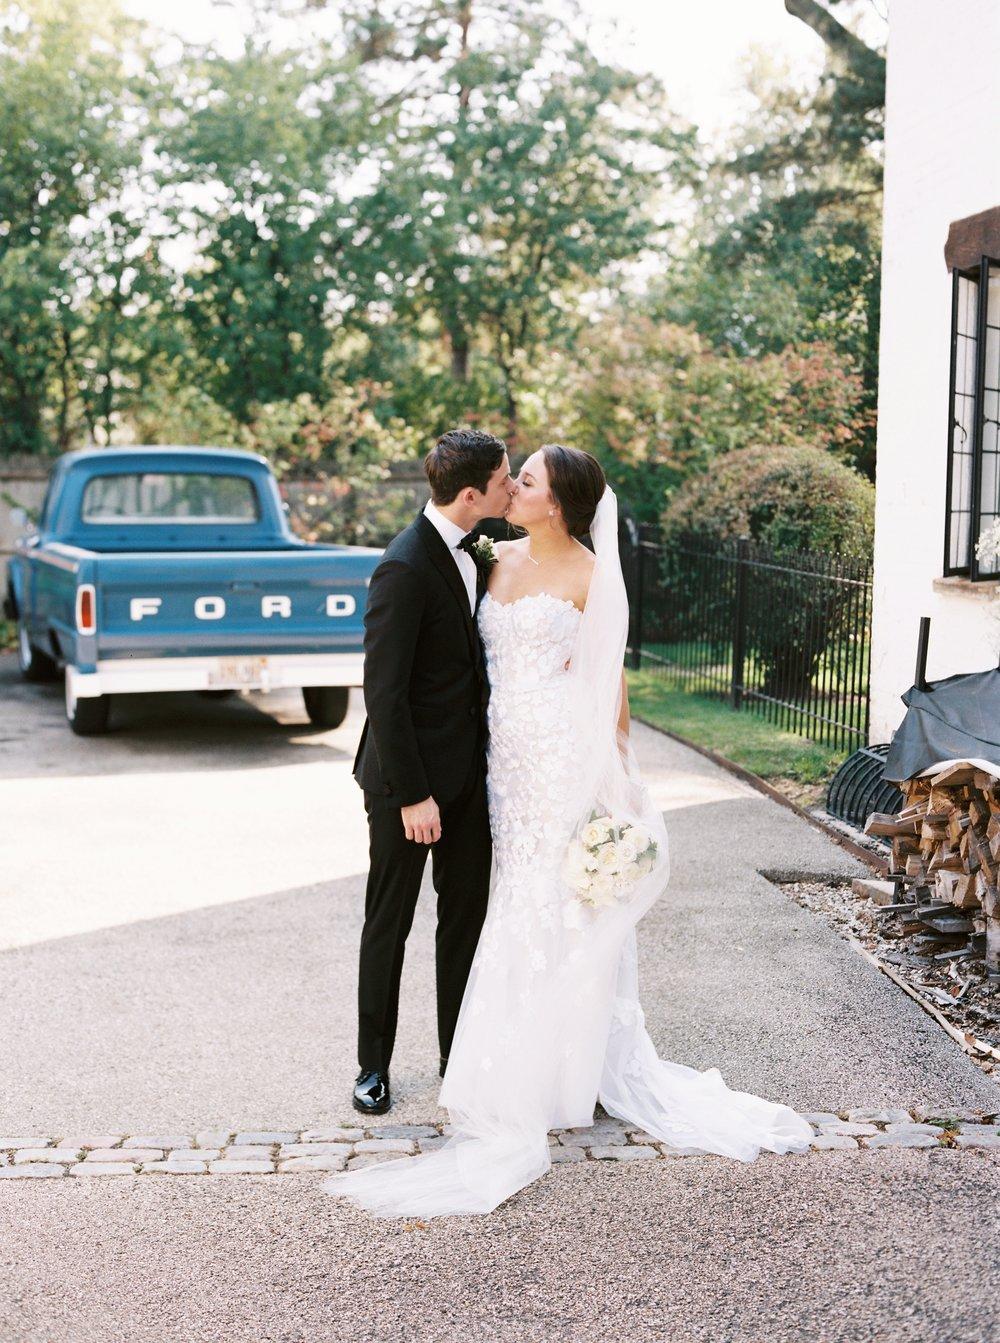 Kyle John l Fine Art Wedding Photography l Chicago, Copenhagen, California, New York, Destination l Blog l Kate and Michael_Winnetka_16